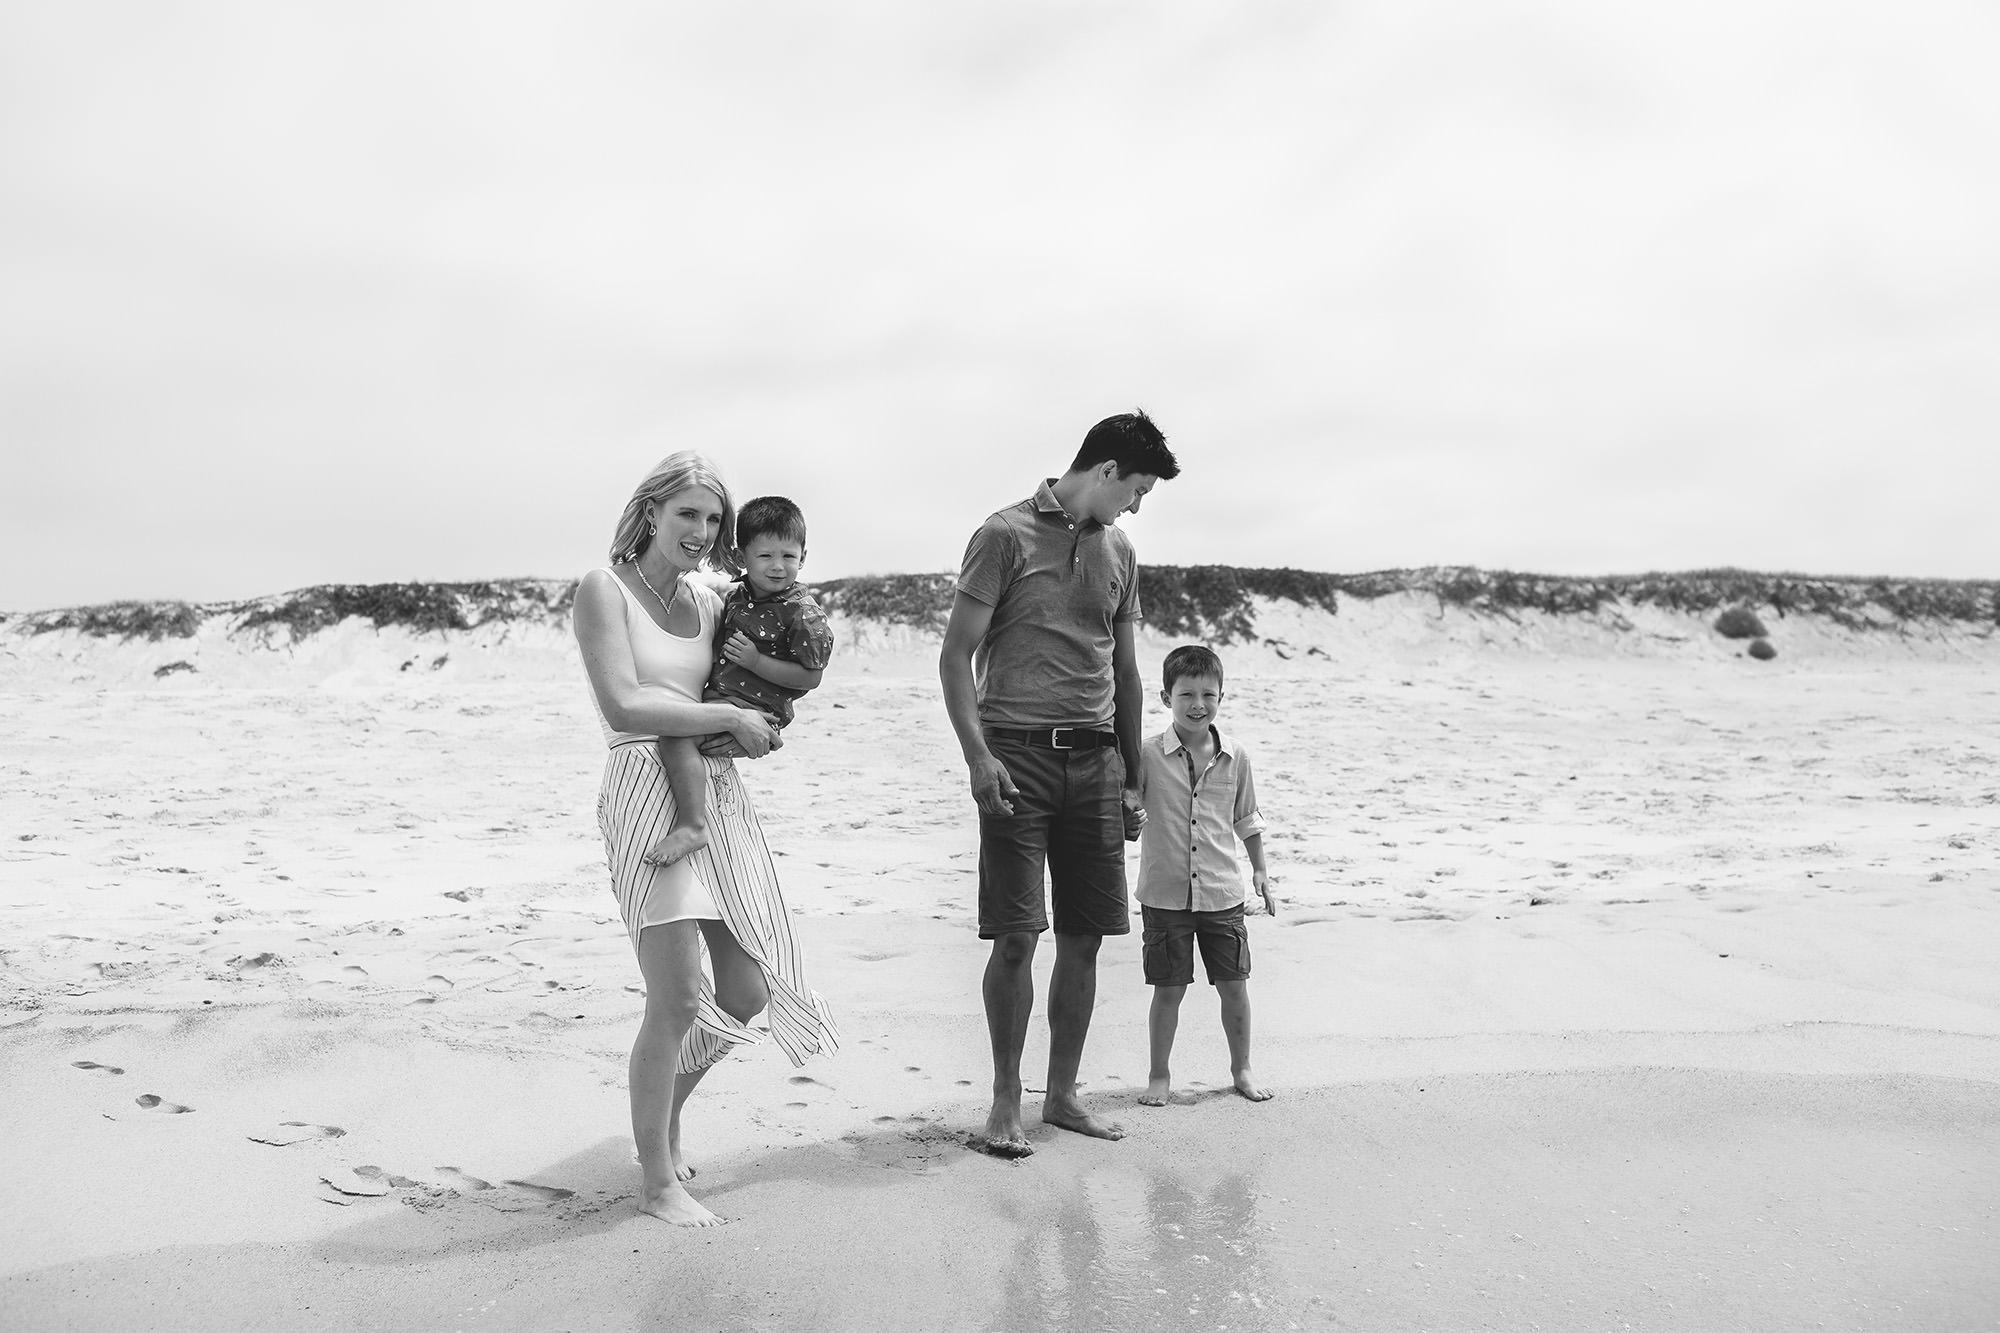 family photoshoot on beach